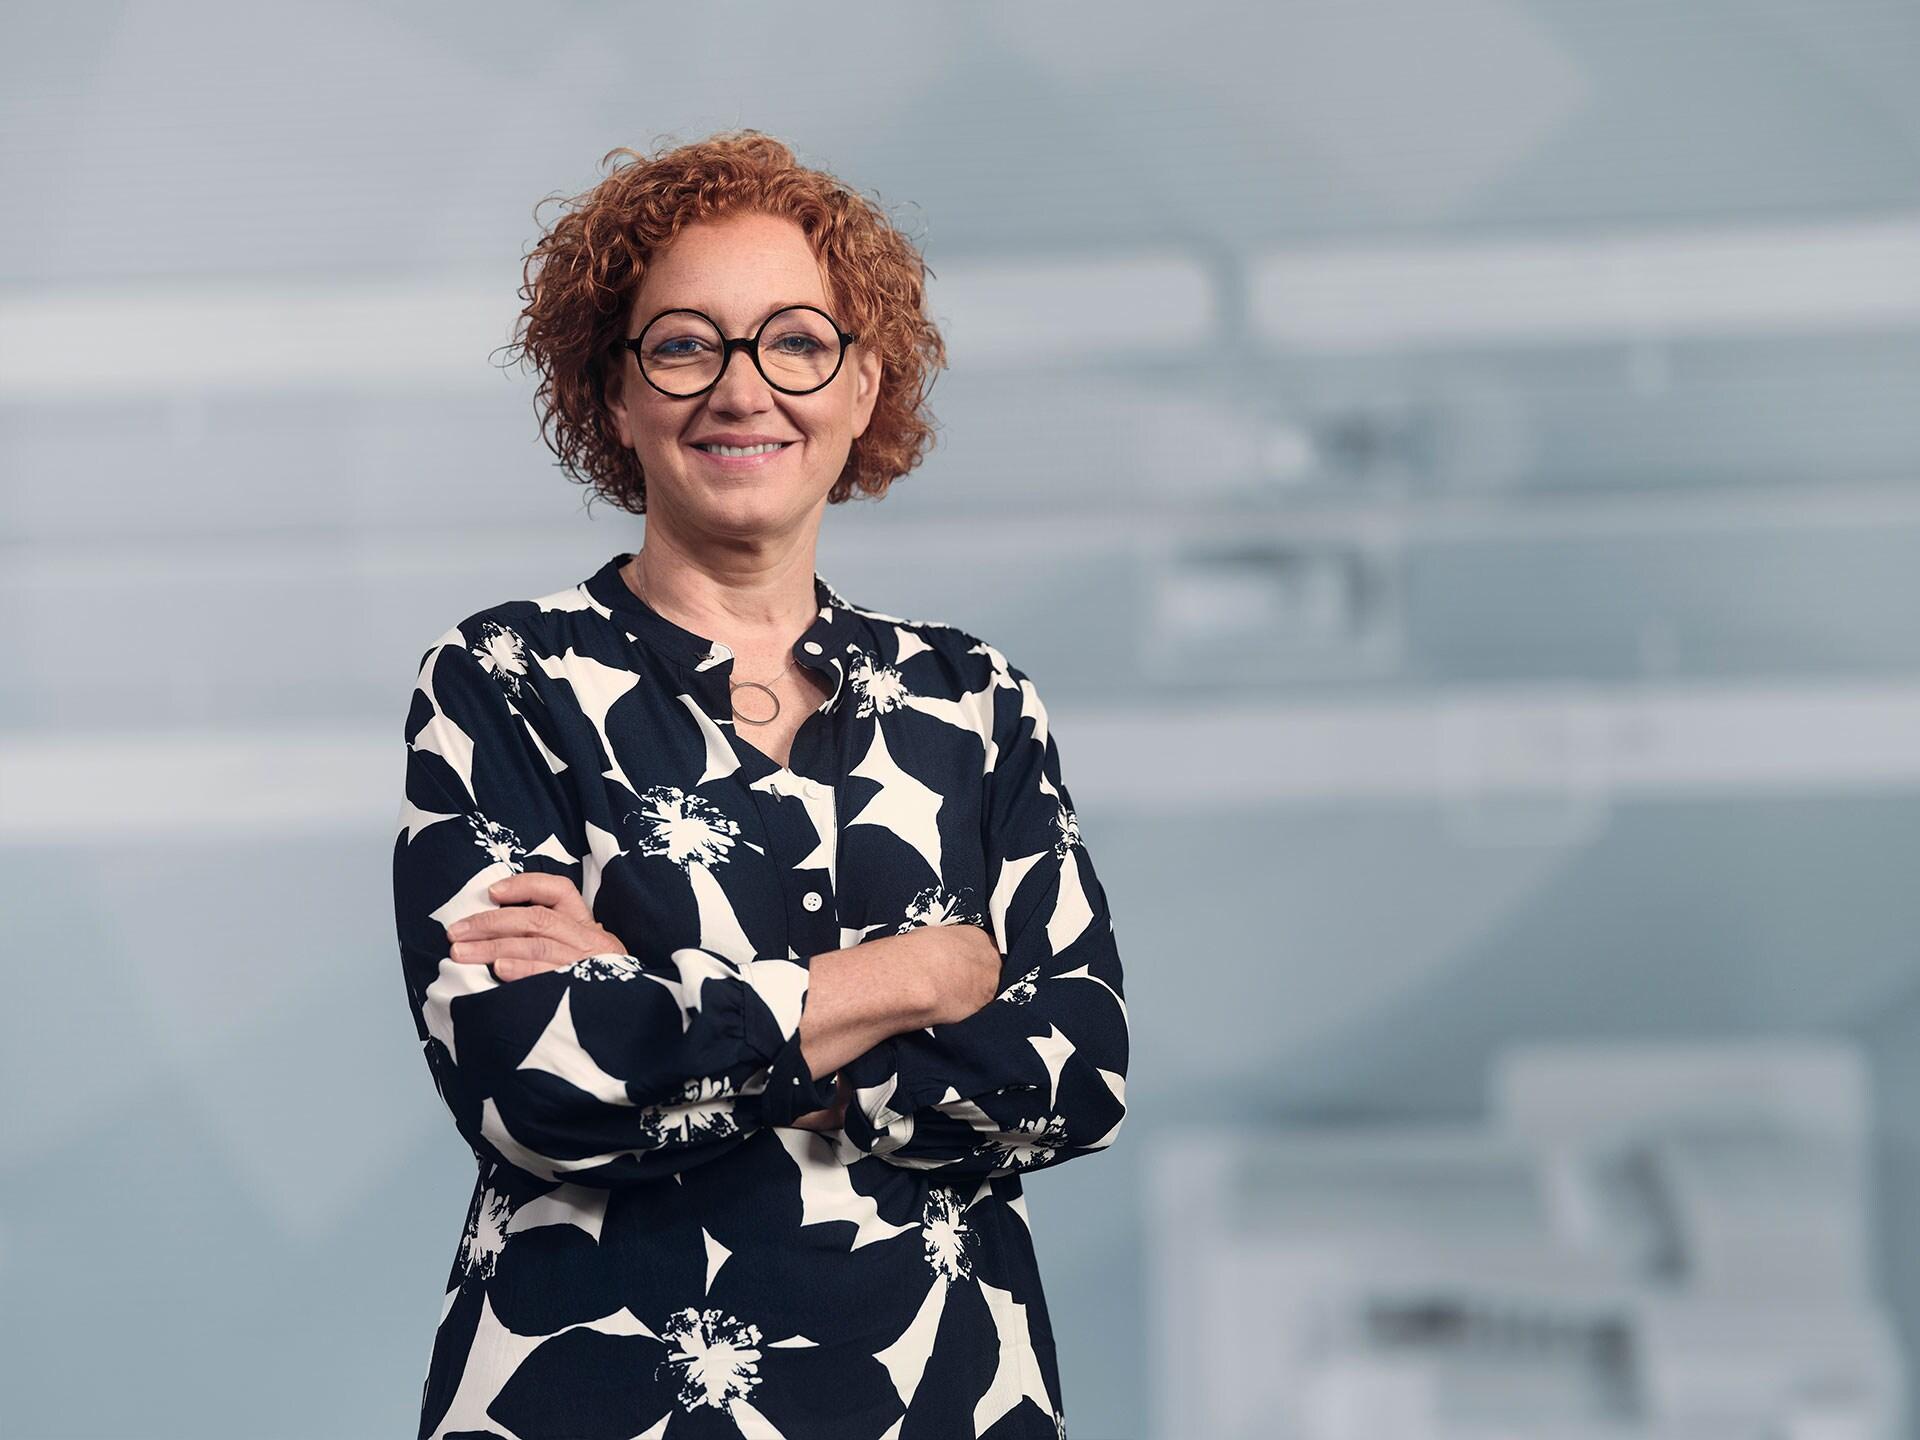 Ödgärd Andersson, Zenseact chief executive Volvo tech moment 2021.